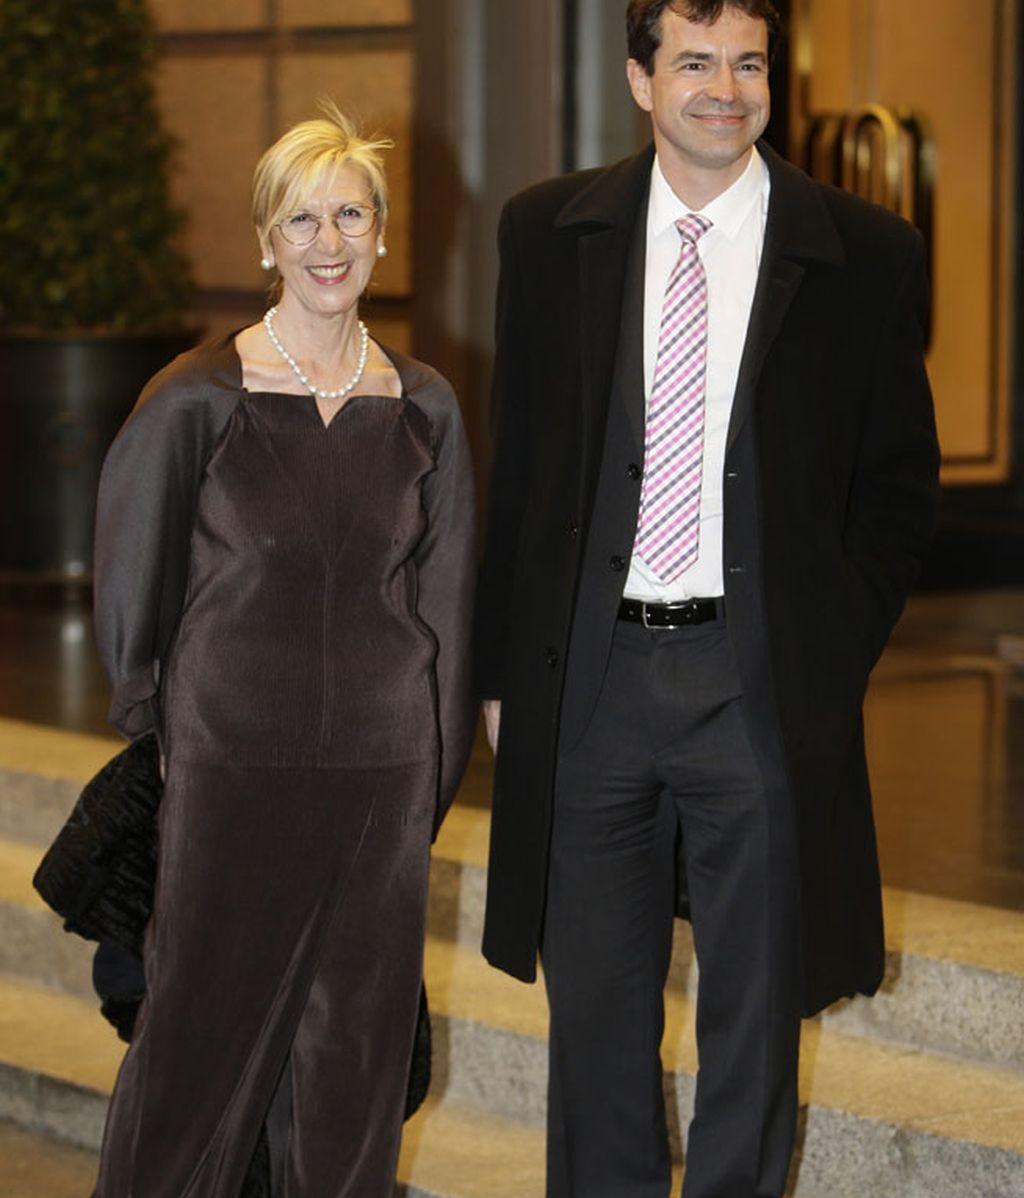 Rosa Díez y Andrés Herzog